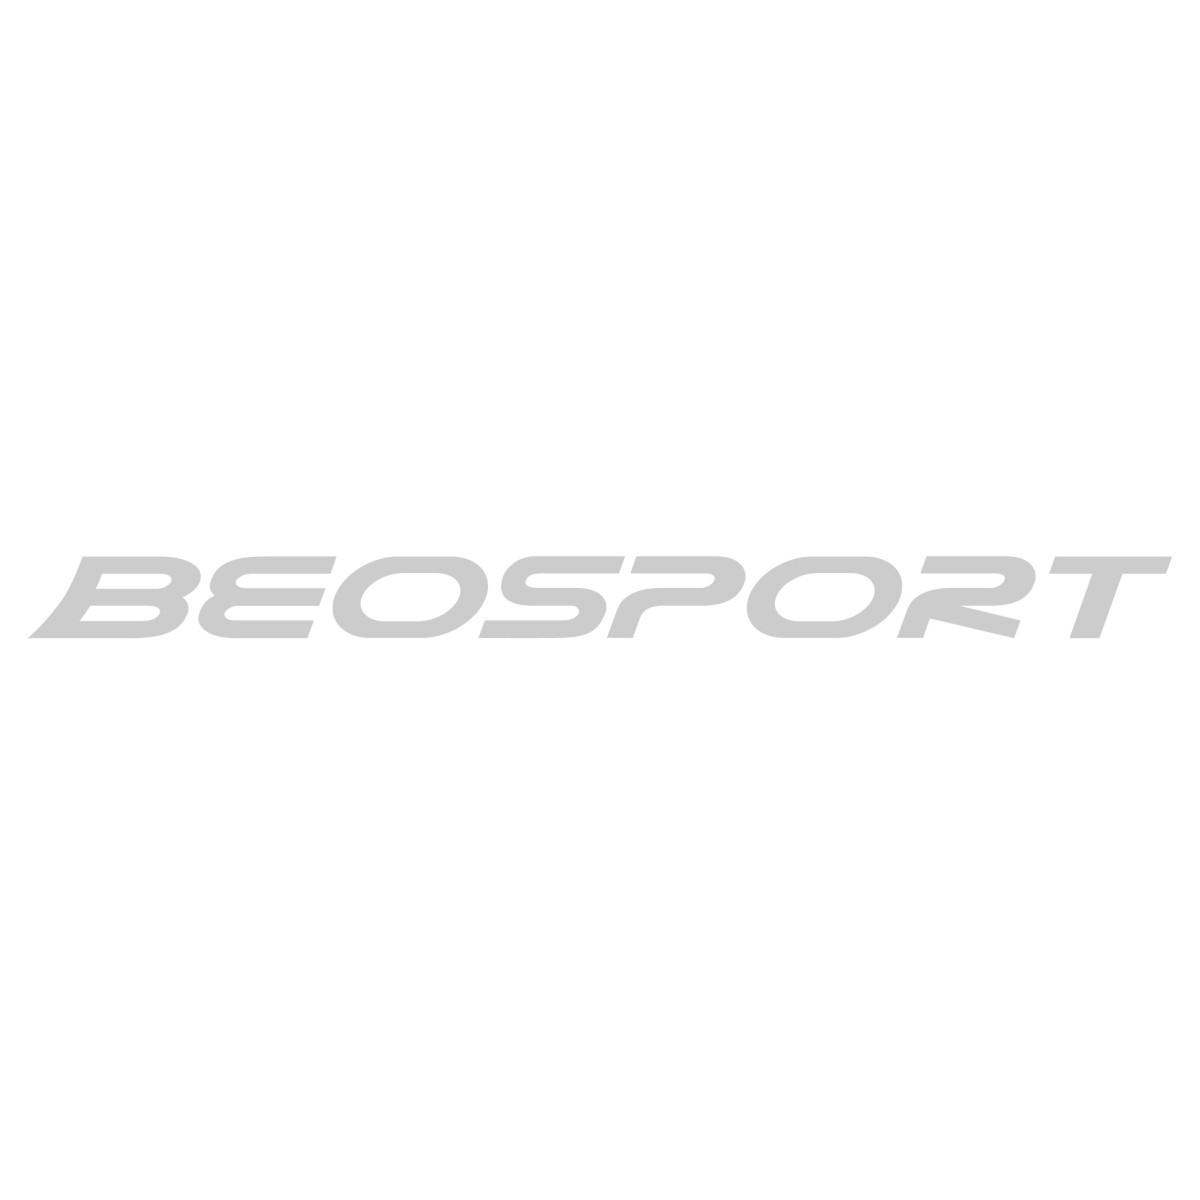 Wilson Lux-Bb Alupower Rough 220m/1.25mm žica za teniske rekete